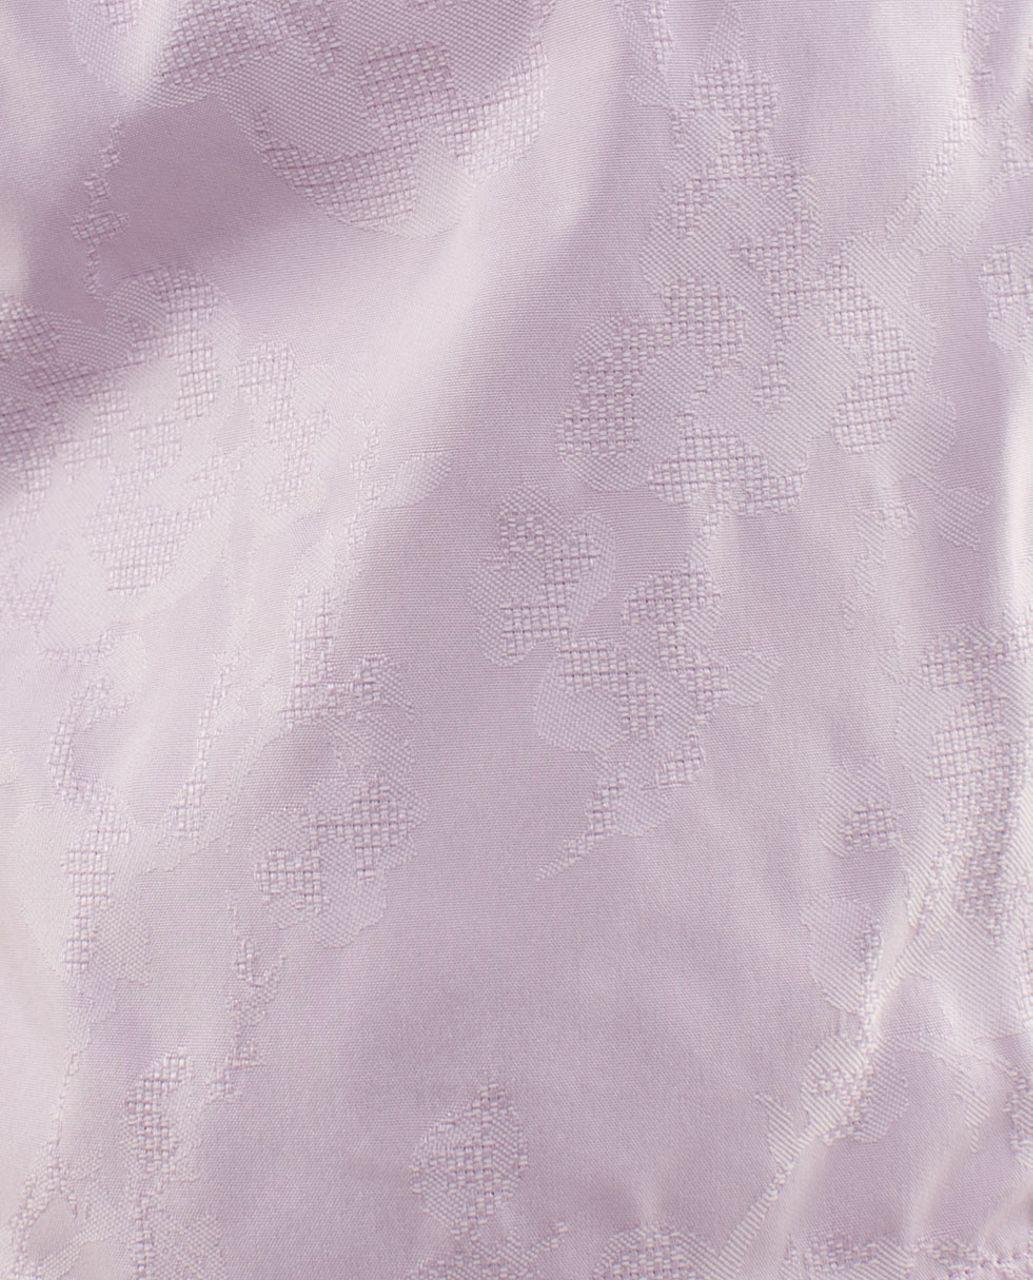 Lululemon Run:  Tracker Short II - Rose Quartz /  Heathered Rose Quartz